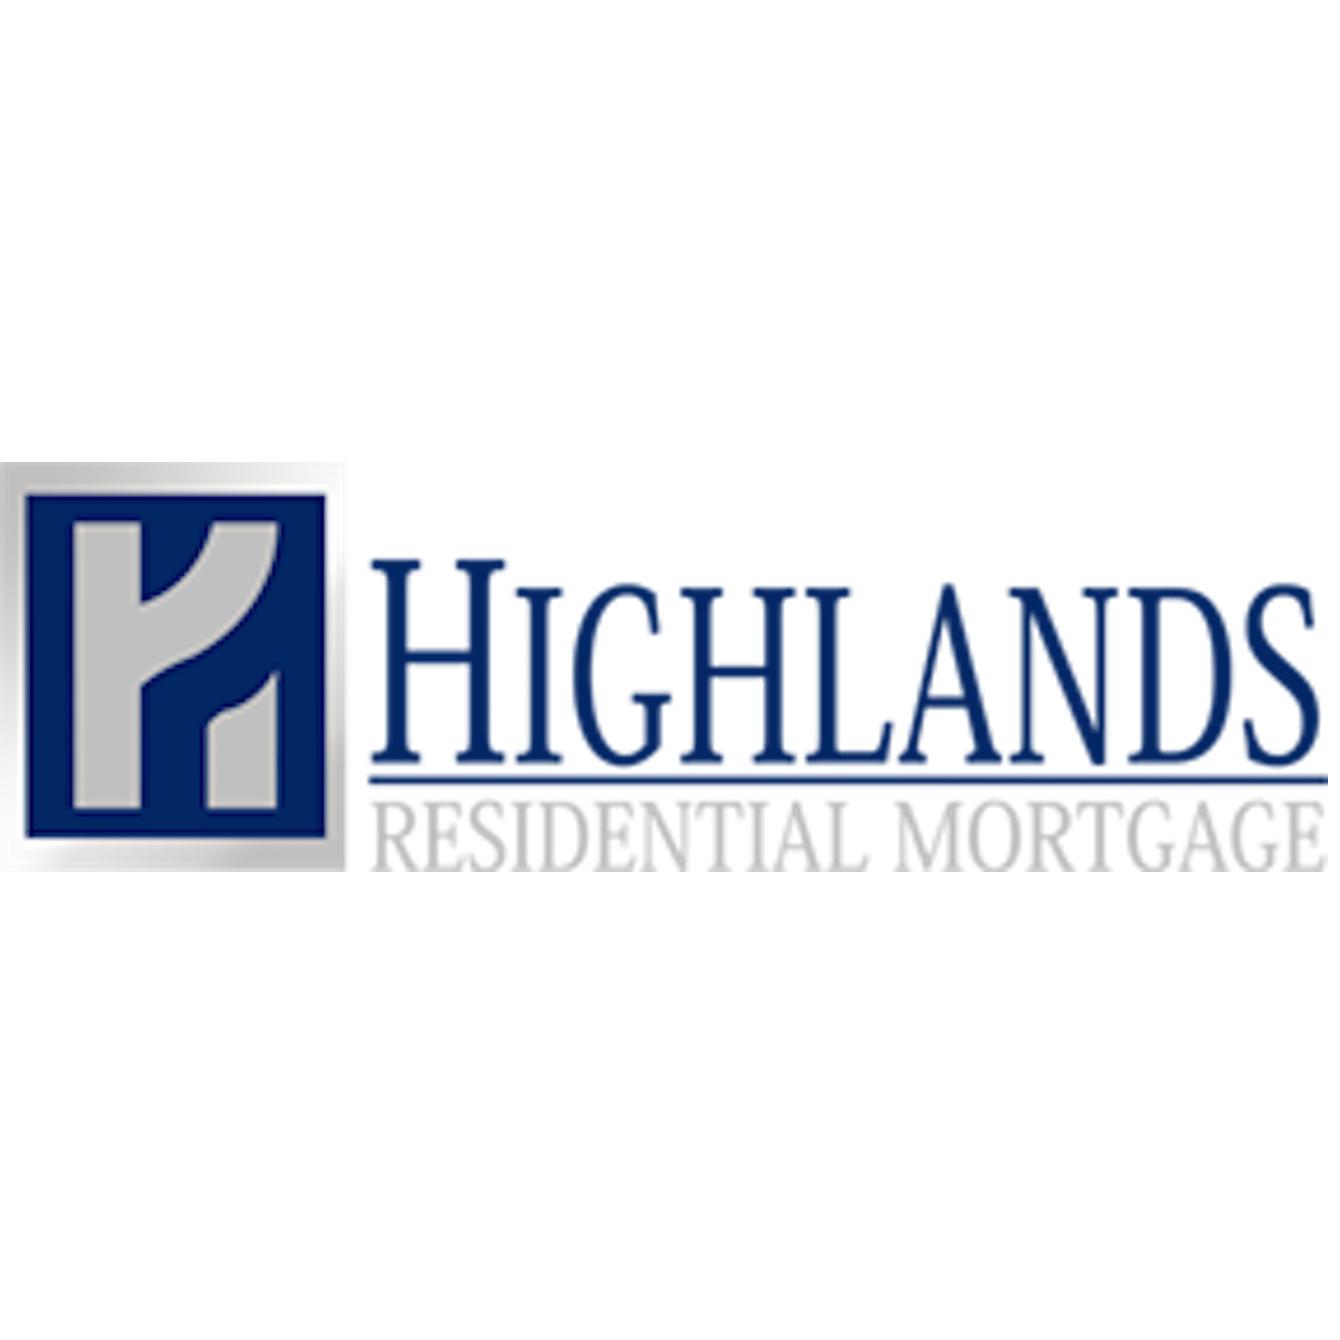 Kristen Walther - Highlands Residential Mortgage, Ltd.